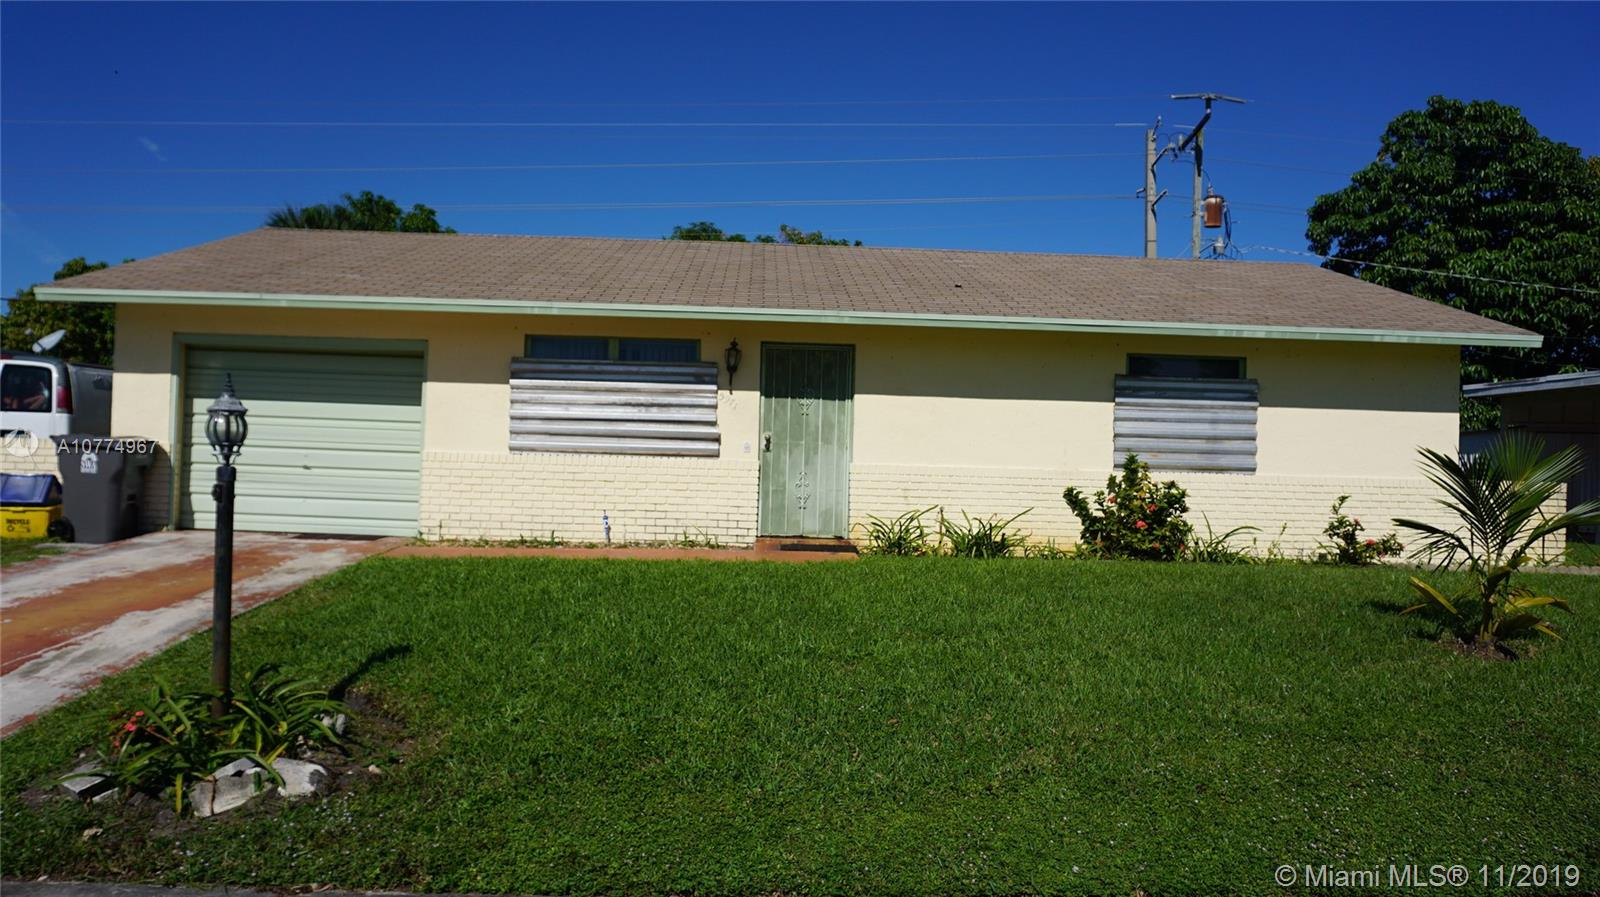 5971 Caribbean Blvd, West Palm Beach, FL 33407